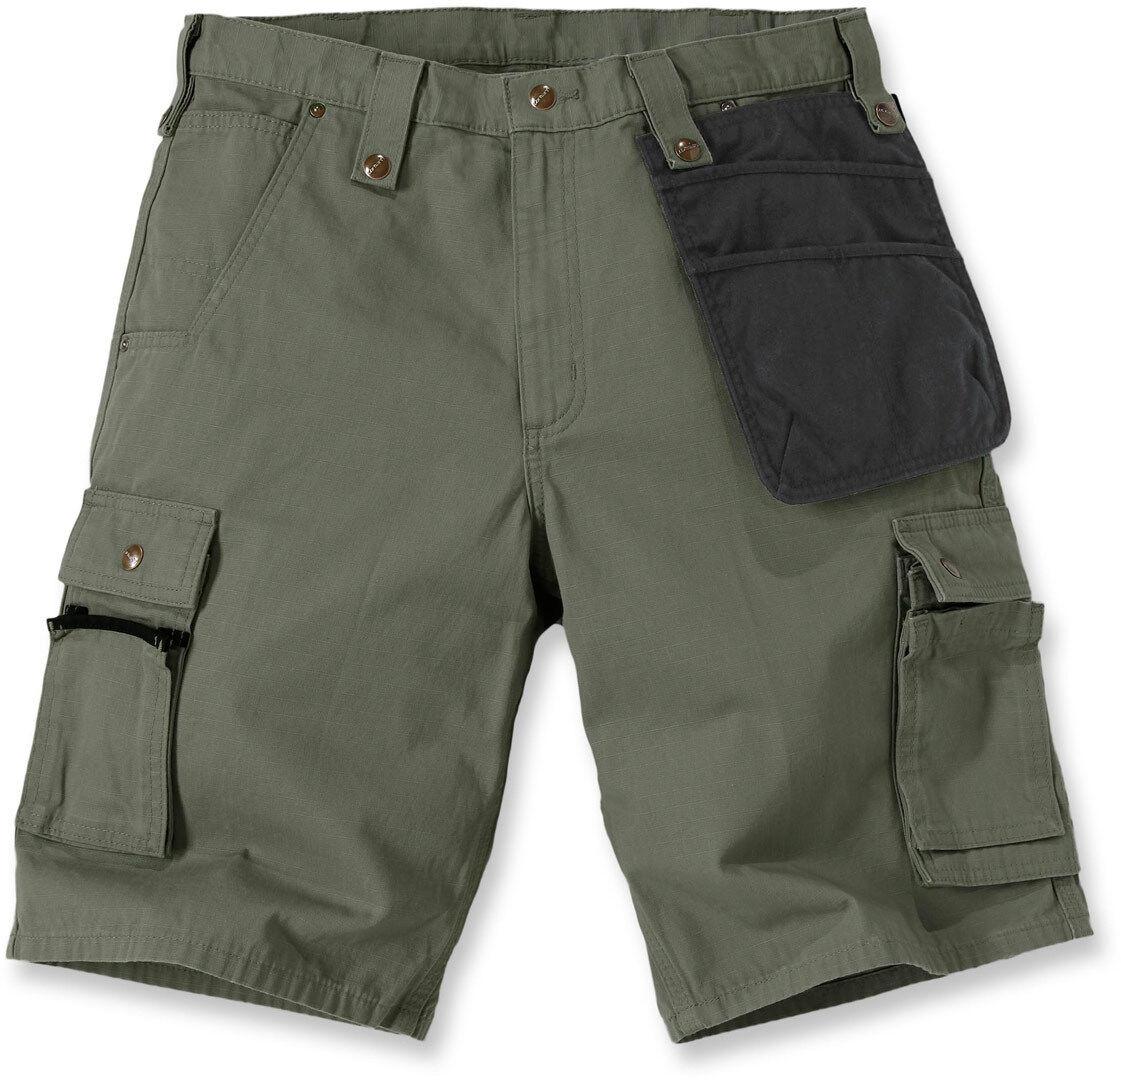 Carhartt Multi Pocket Ripstop Pantalones cortos Verde 40